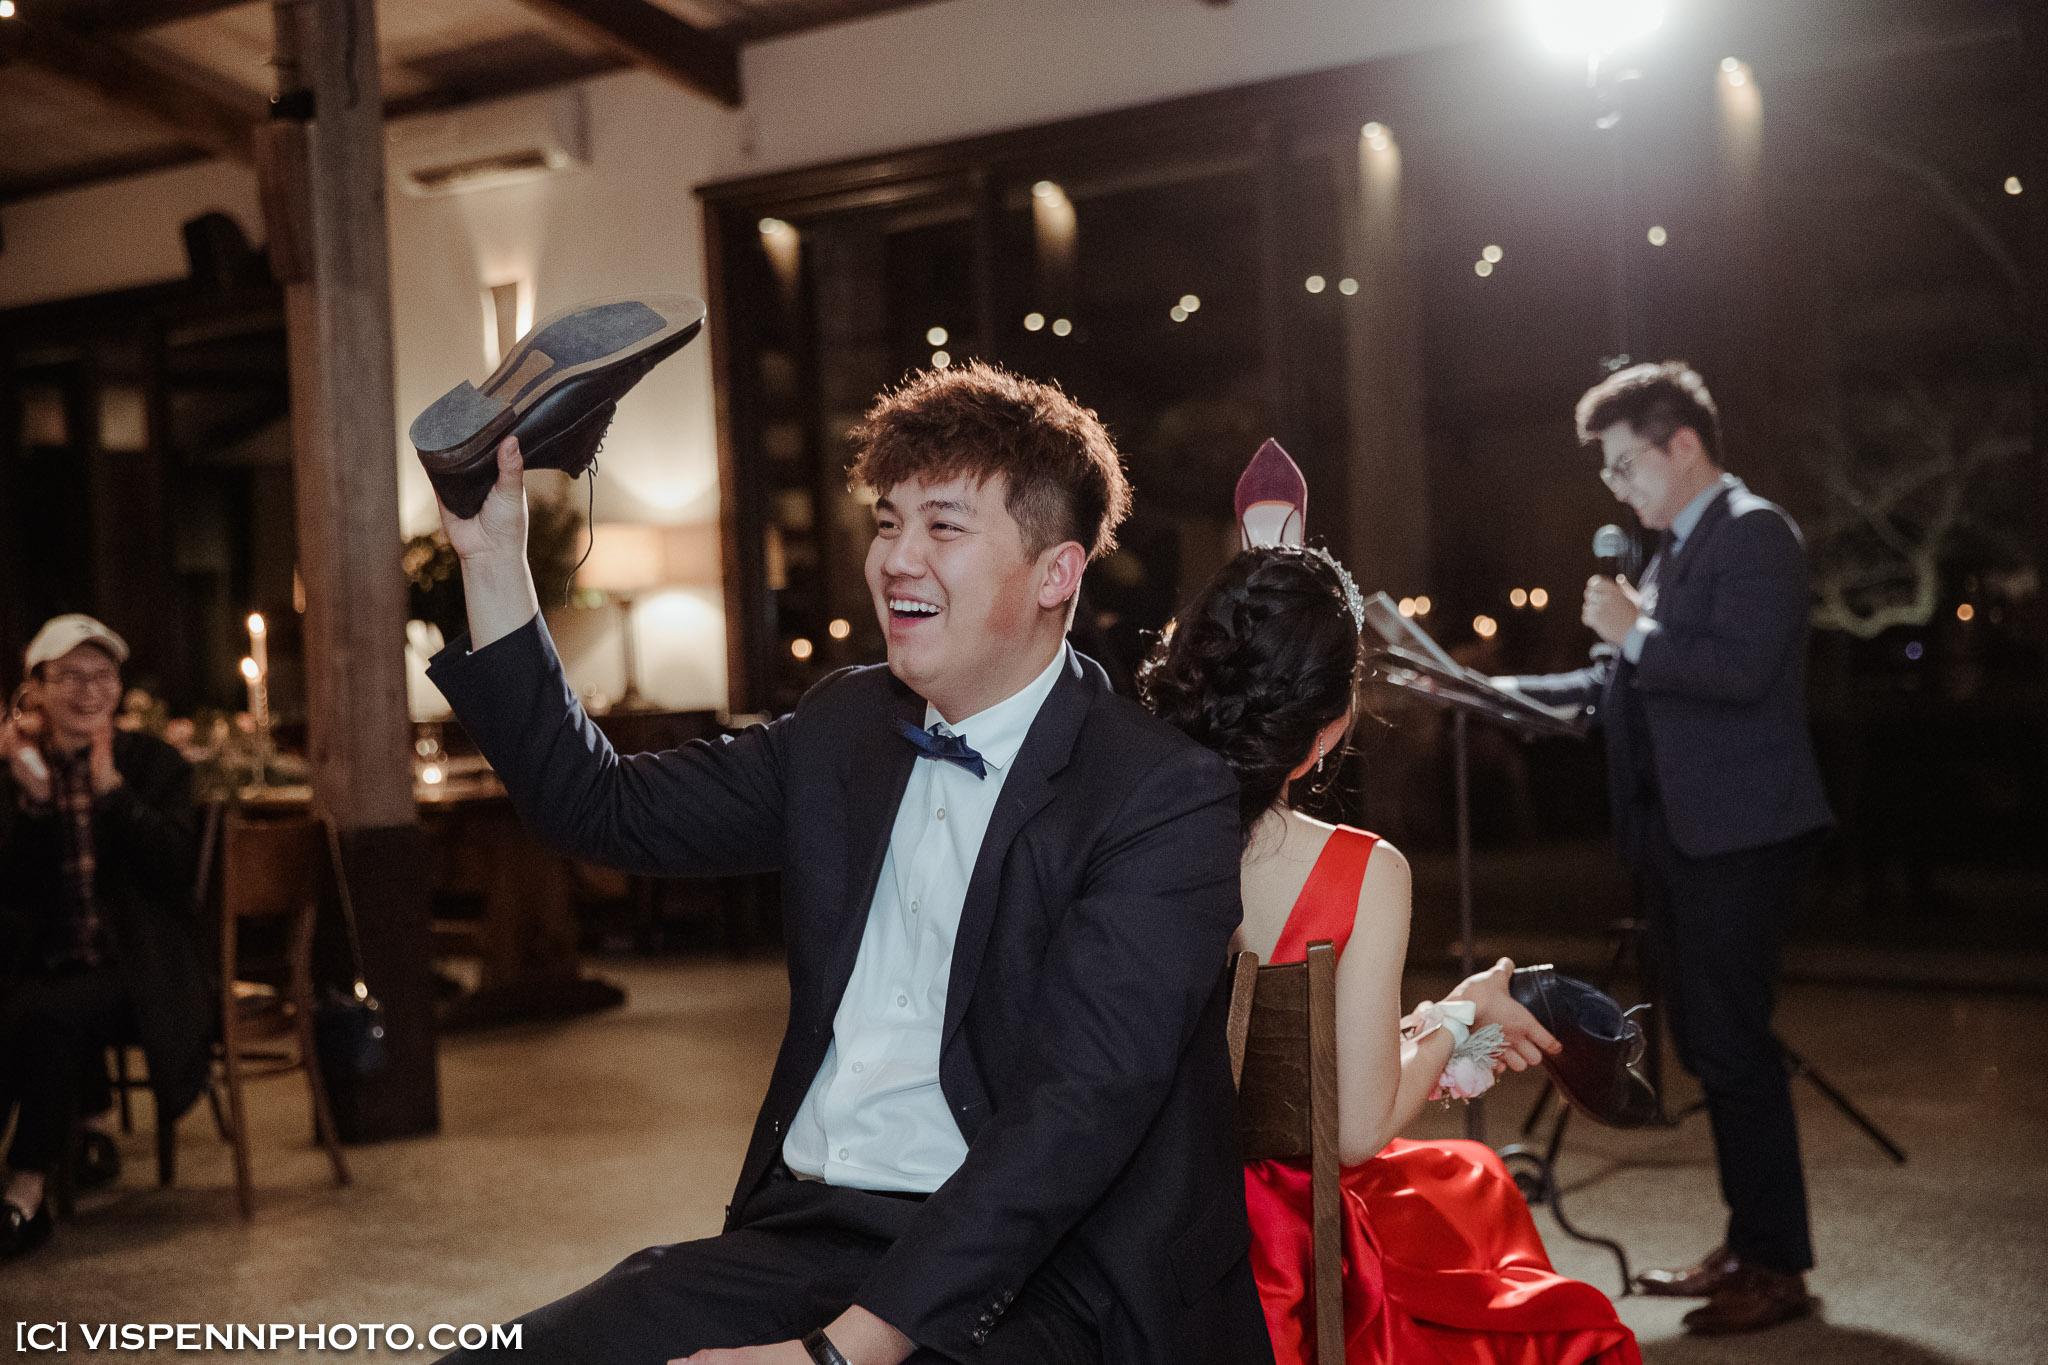 WEDDING DAY Photography Melbourne CoreyCoco 3P 10361 1DX ZHPENN